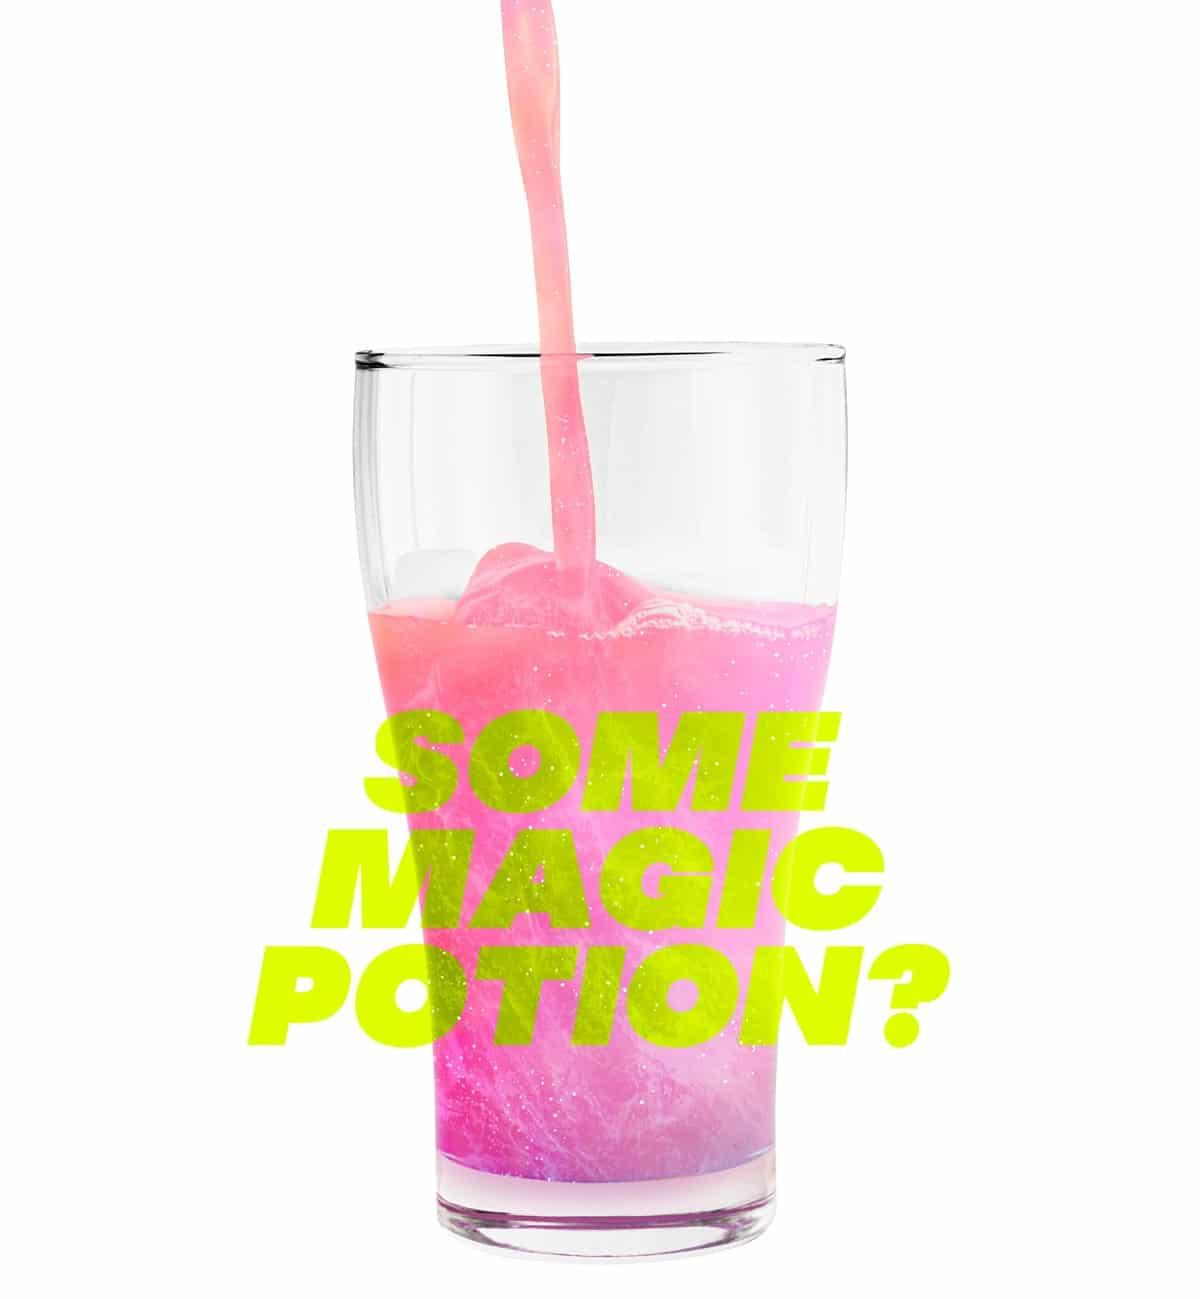 Pinke Brause im Glas